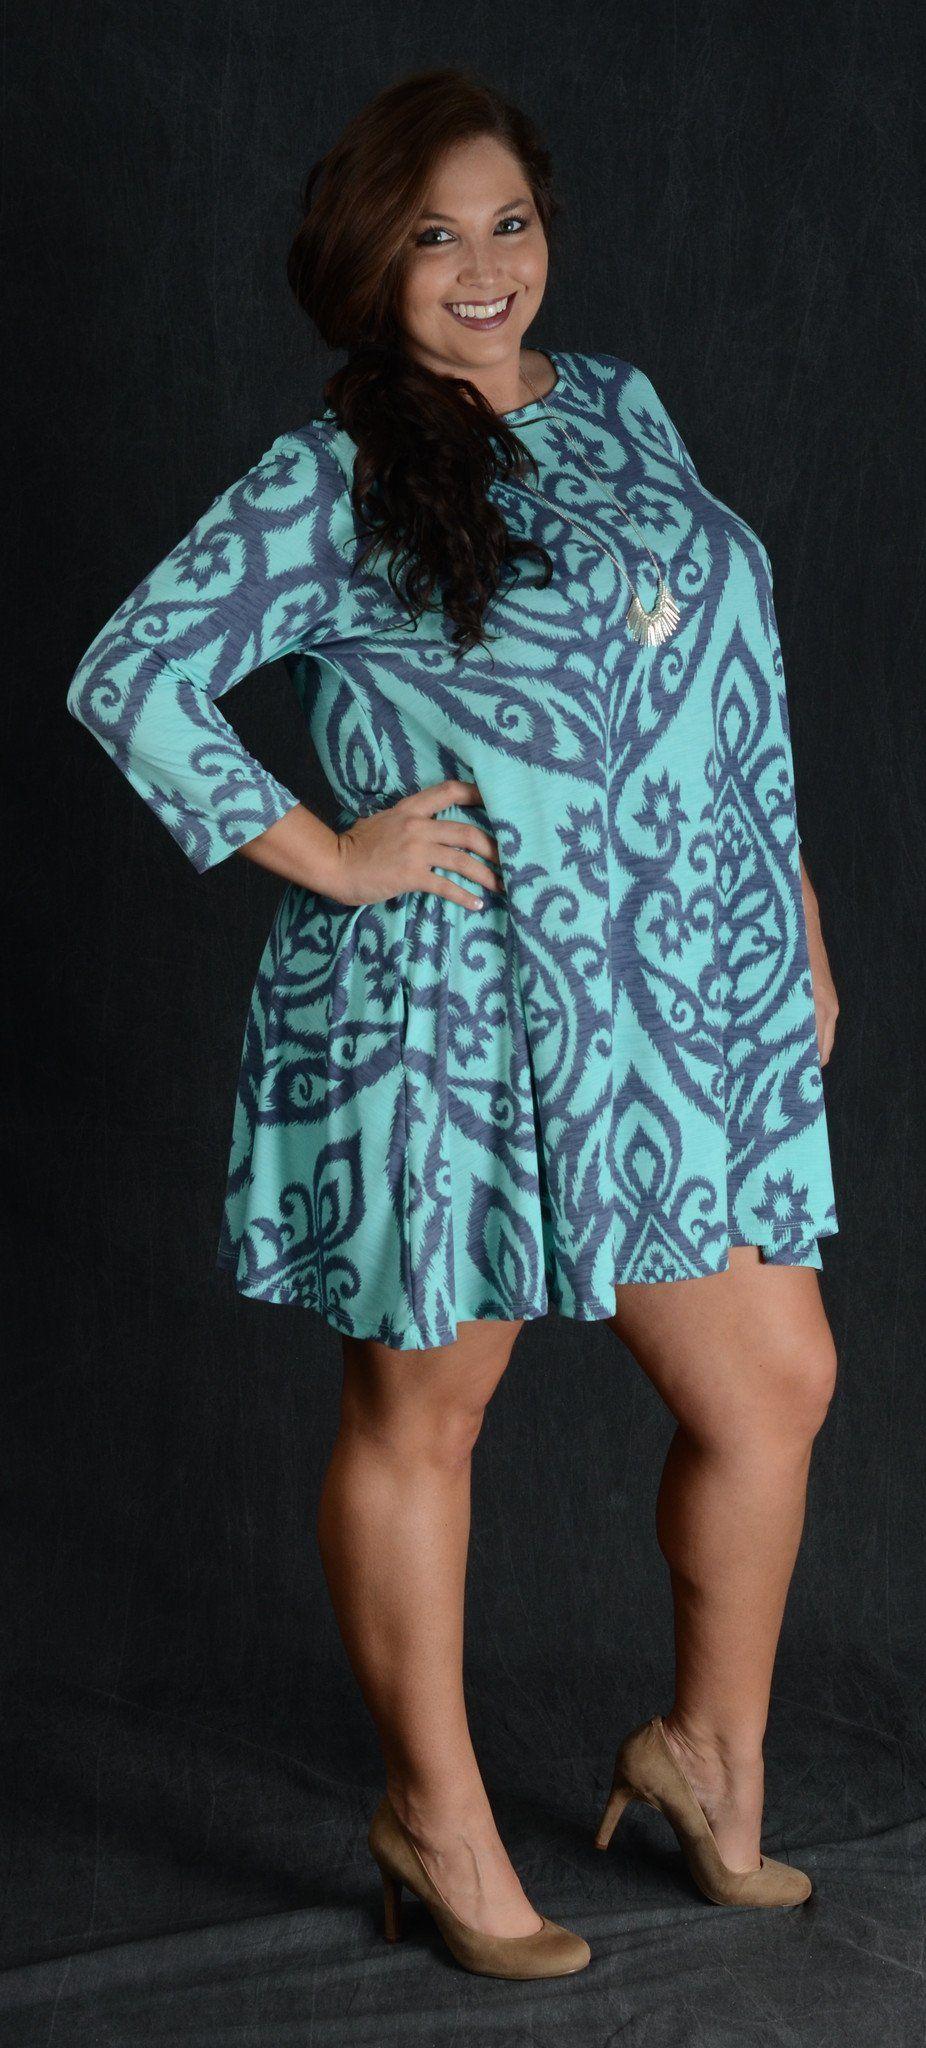 f7a303c747b Gray   Light Blue Damask Dress - Curvy Plus Size Boutique - 1 ...